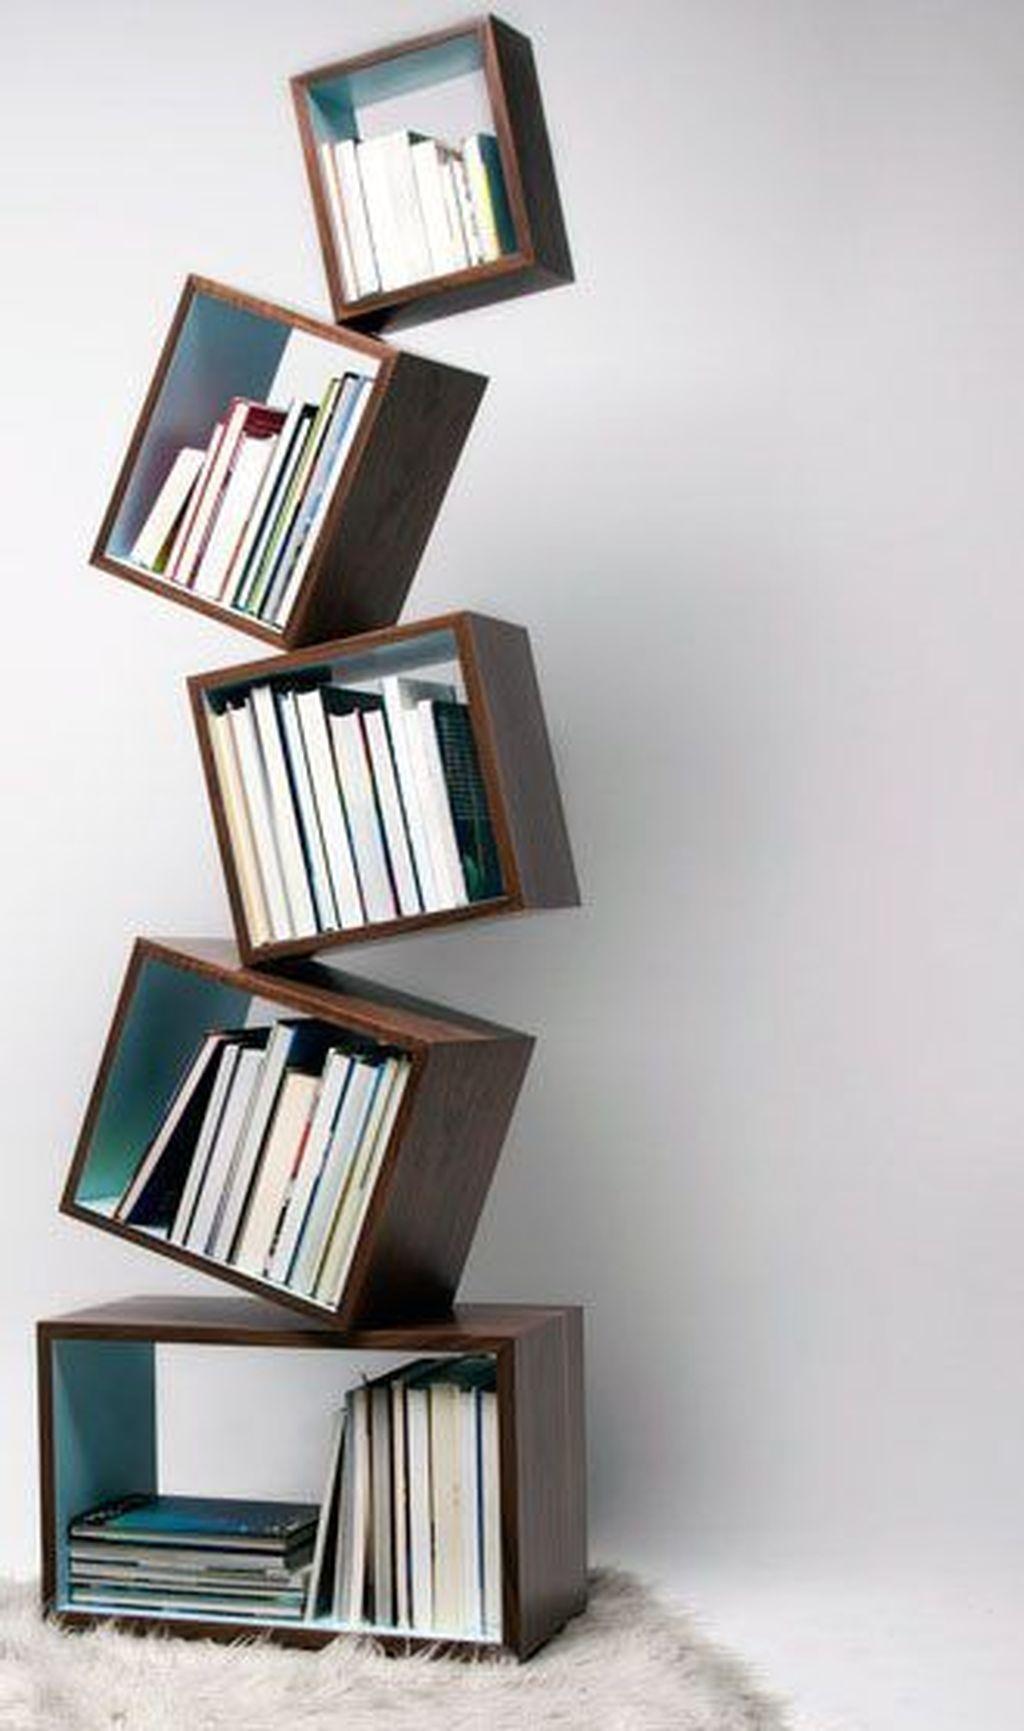 38 Creative Diy Bookshelf Ideas To Try Asap Bookshelves Diy Bookshelves For Small Spaces Creative Bookshelves